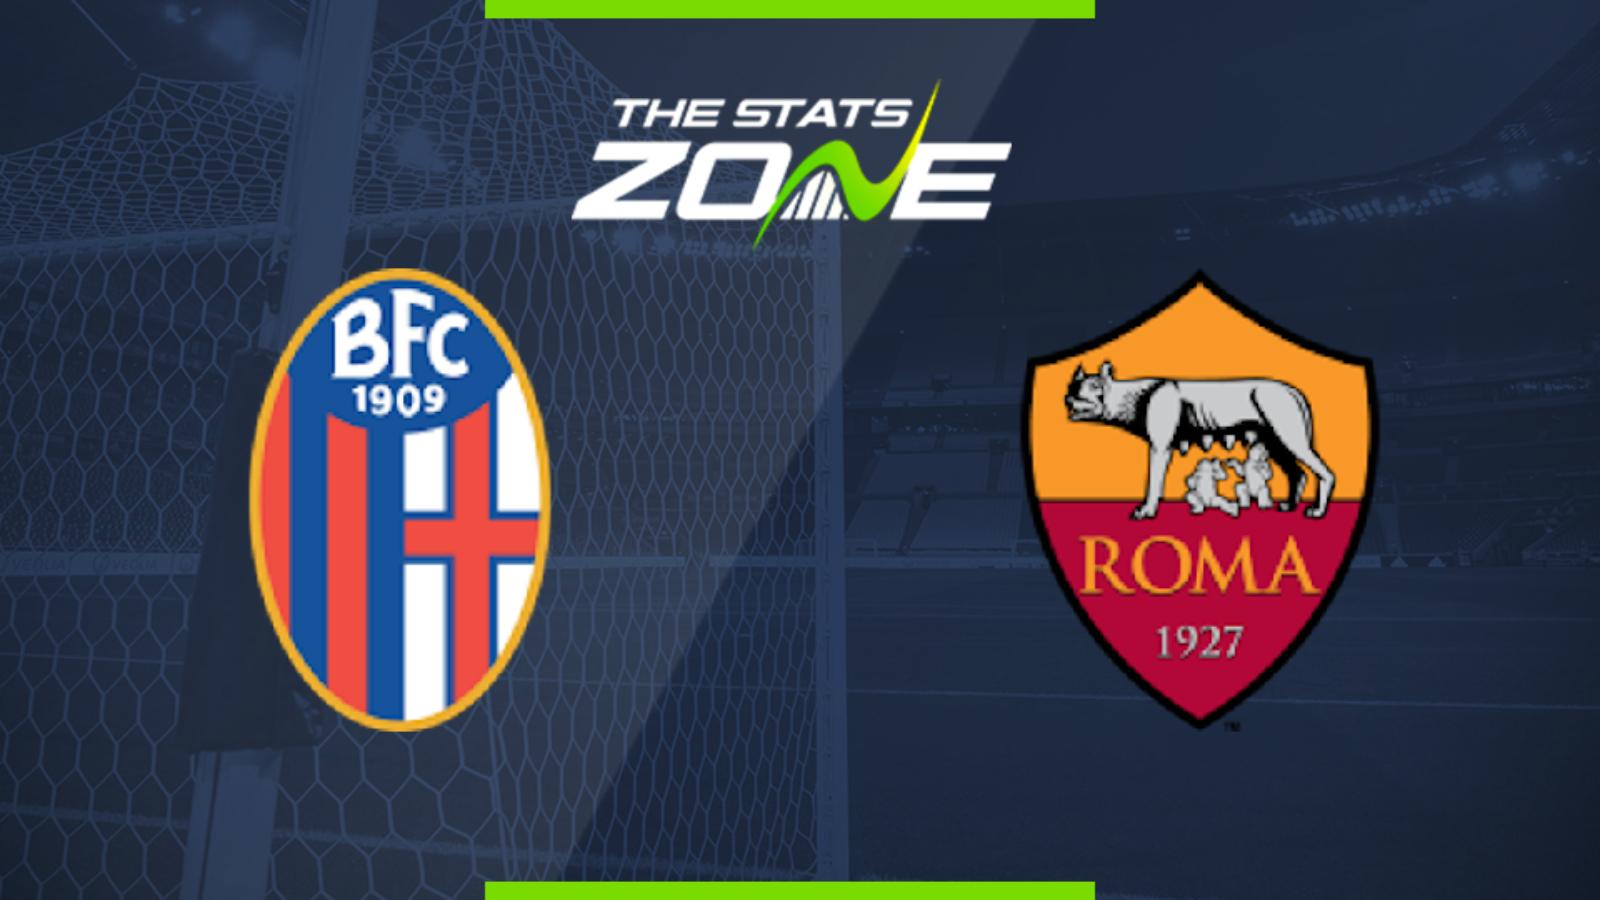 Bologna vs roma betting tips horse race betting in mumbai cable